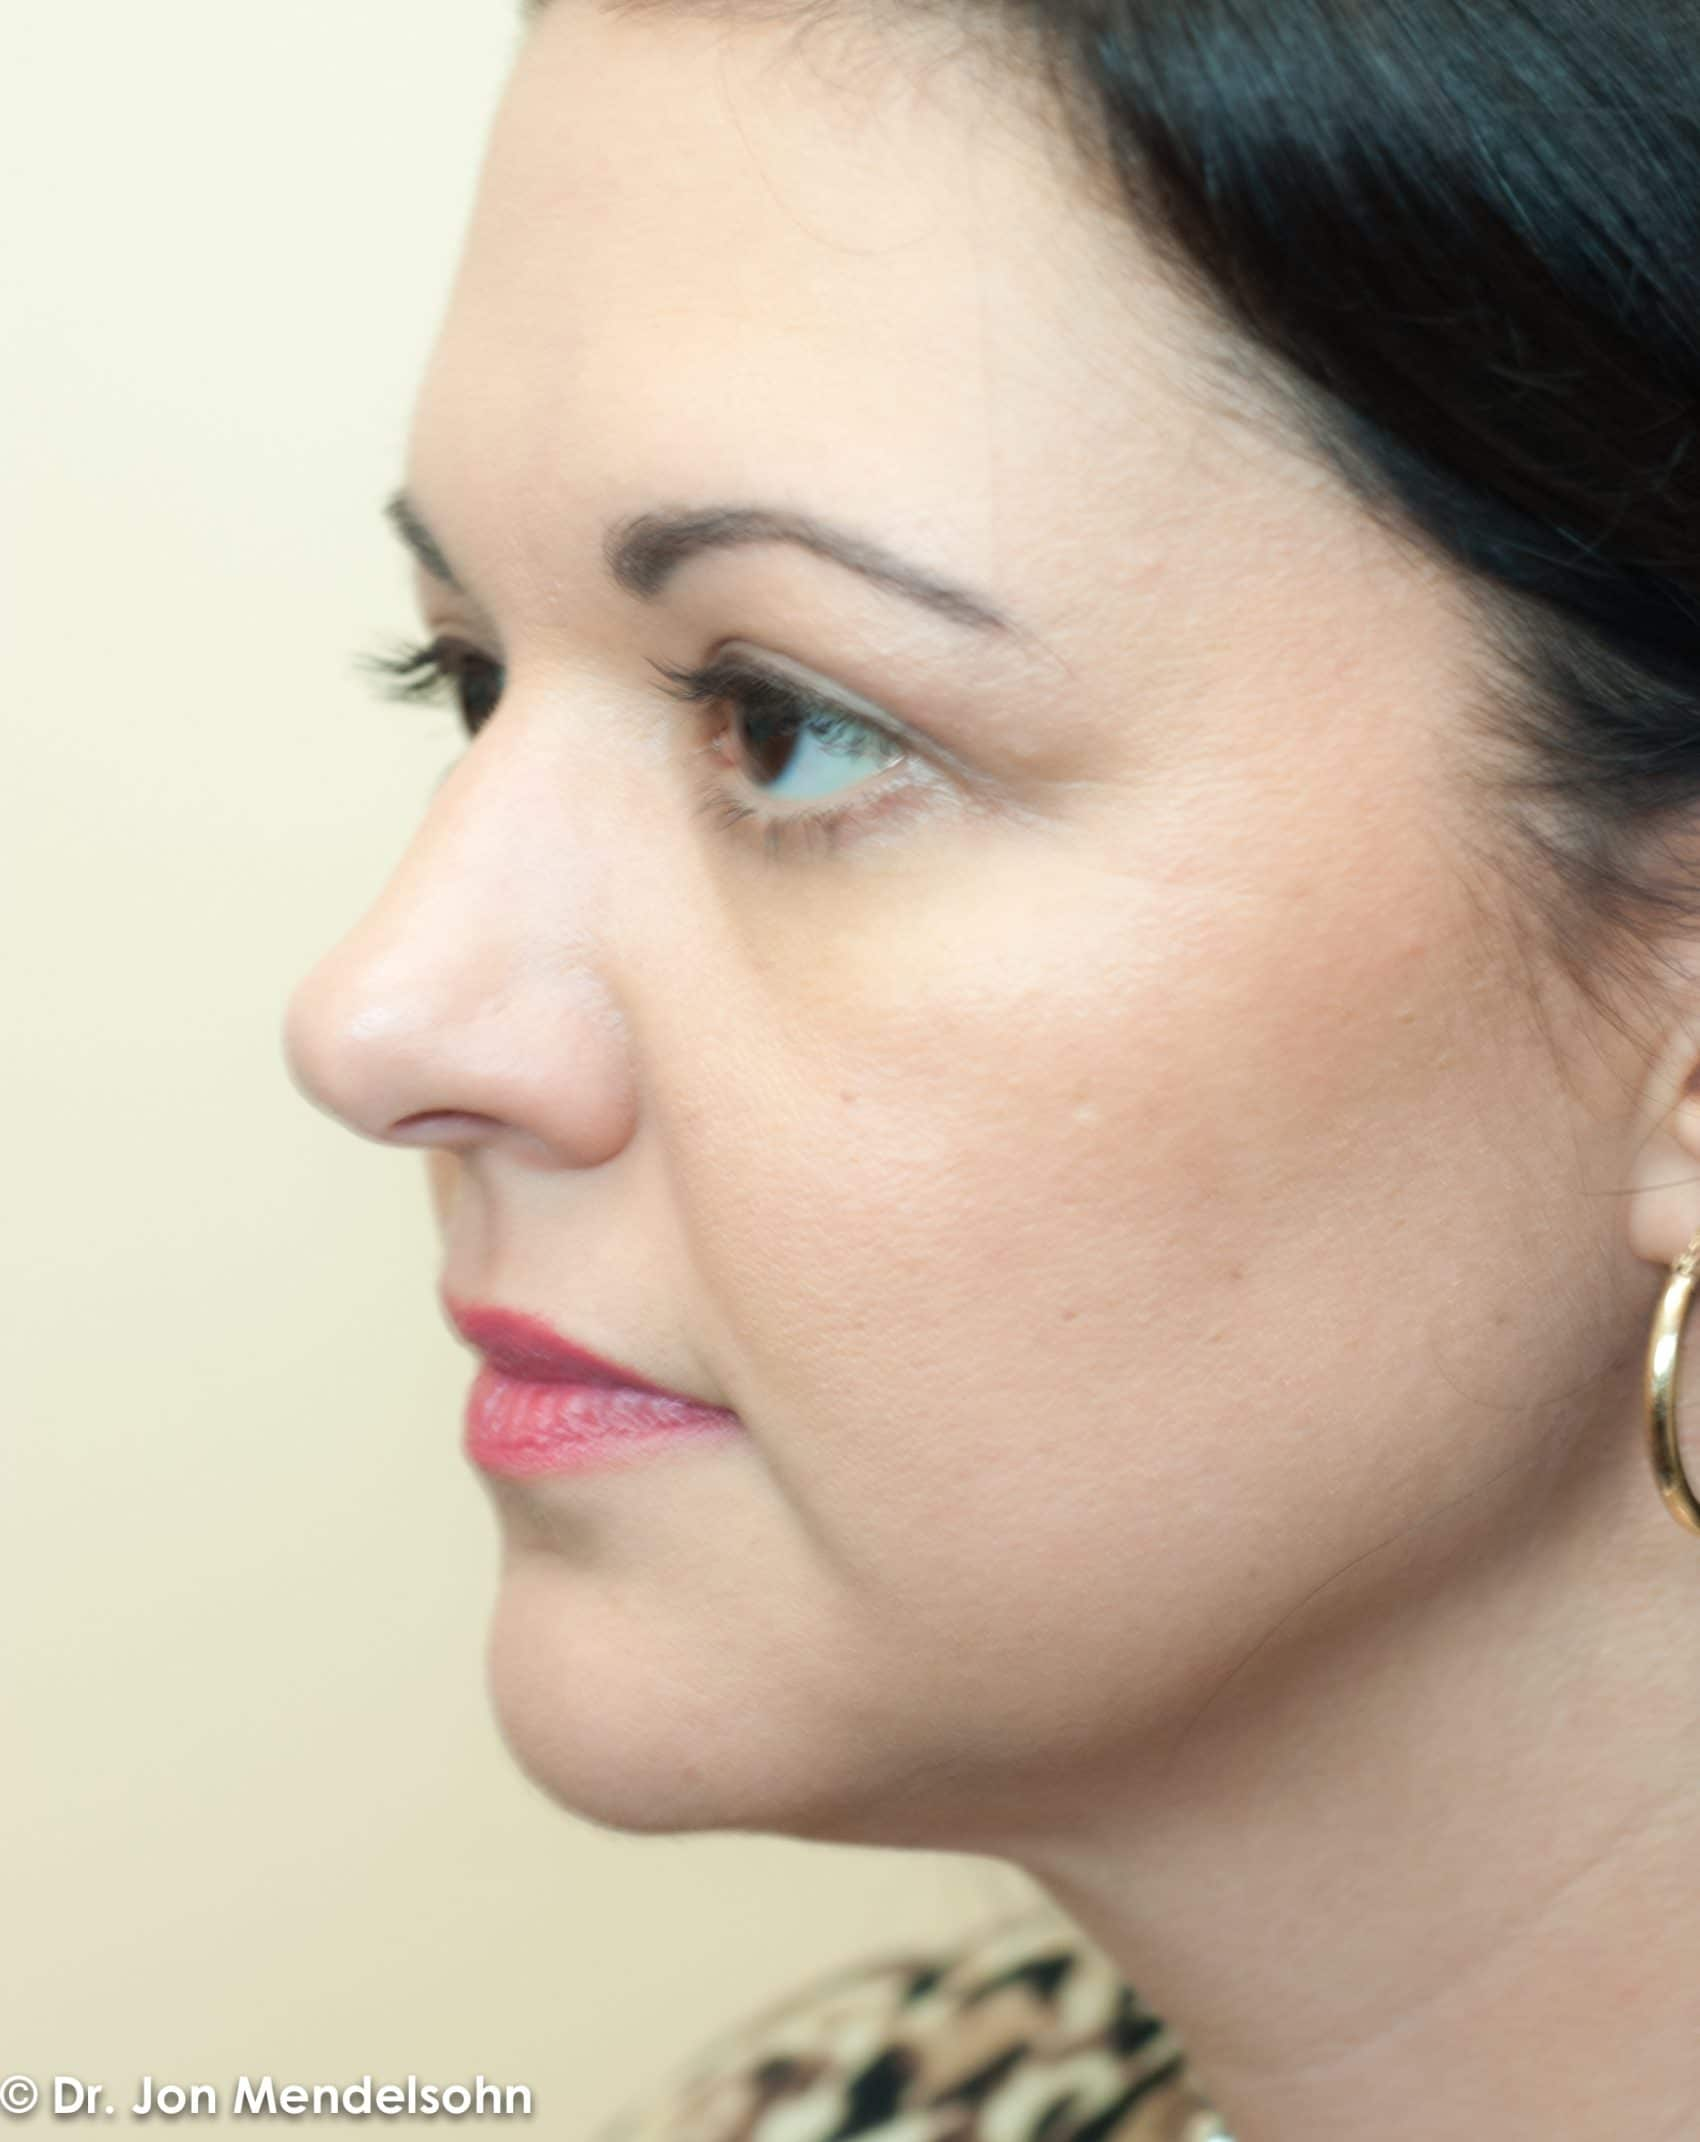 Upper-blepharoplasty-eyelid-surgery-cincinnati-dr-jon-mendelsohn-best-eyelid-surgery-plastic-surgery-realself-truseselfies-three-quarter-left-after-Mahan_Crystal-3924-2